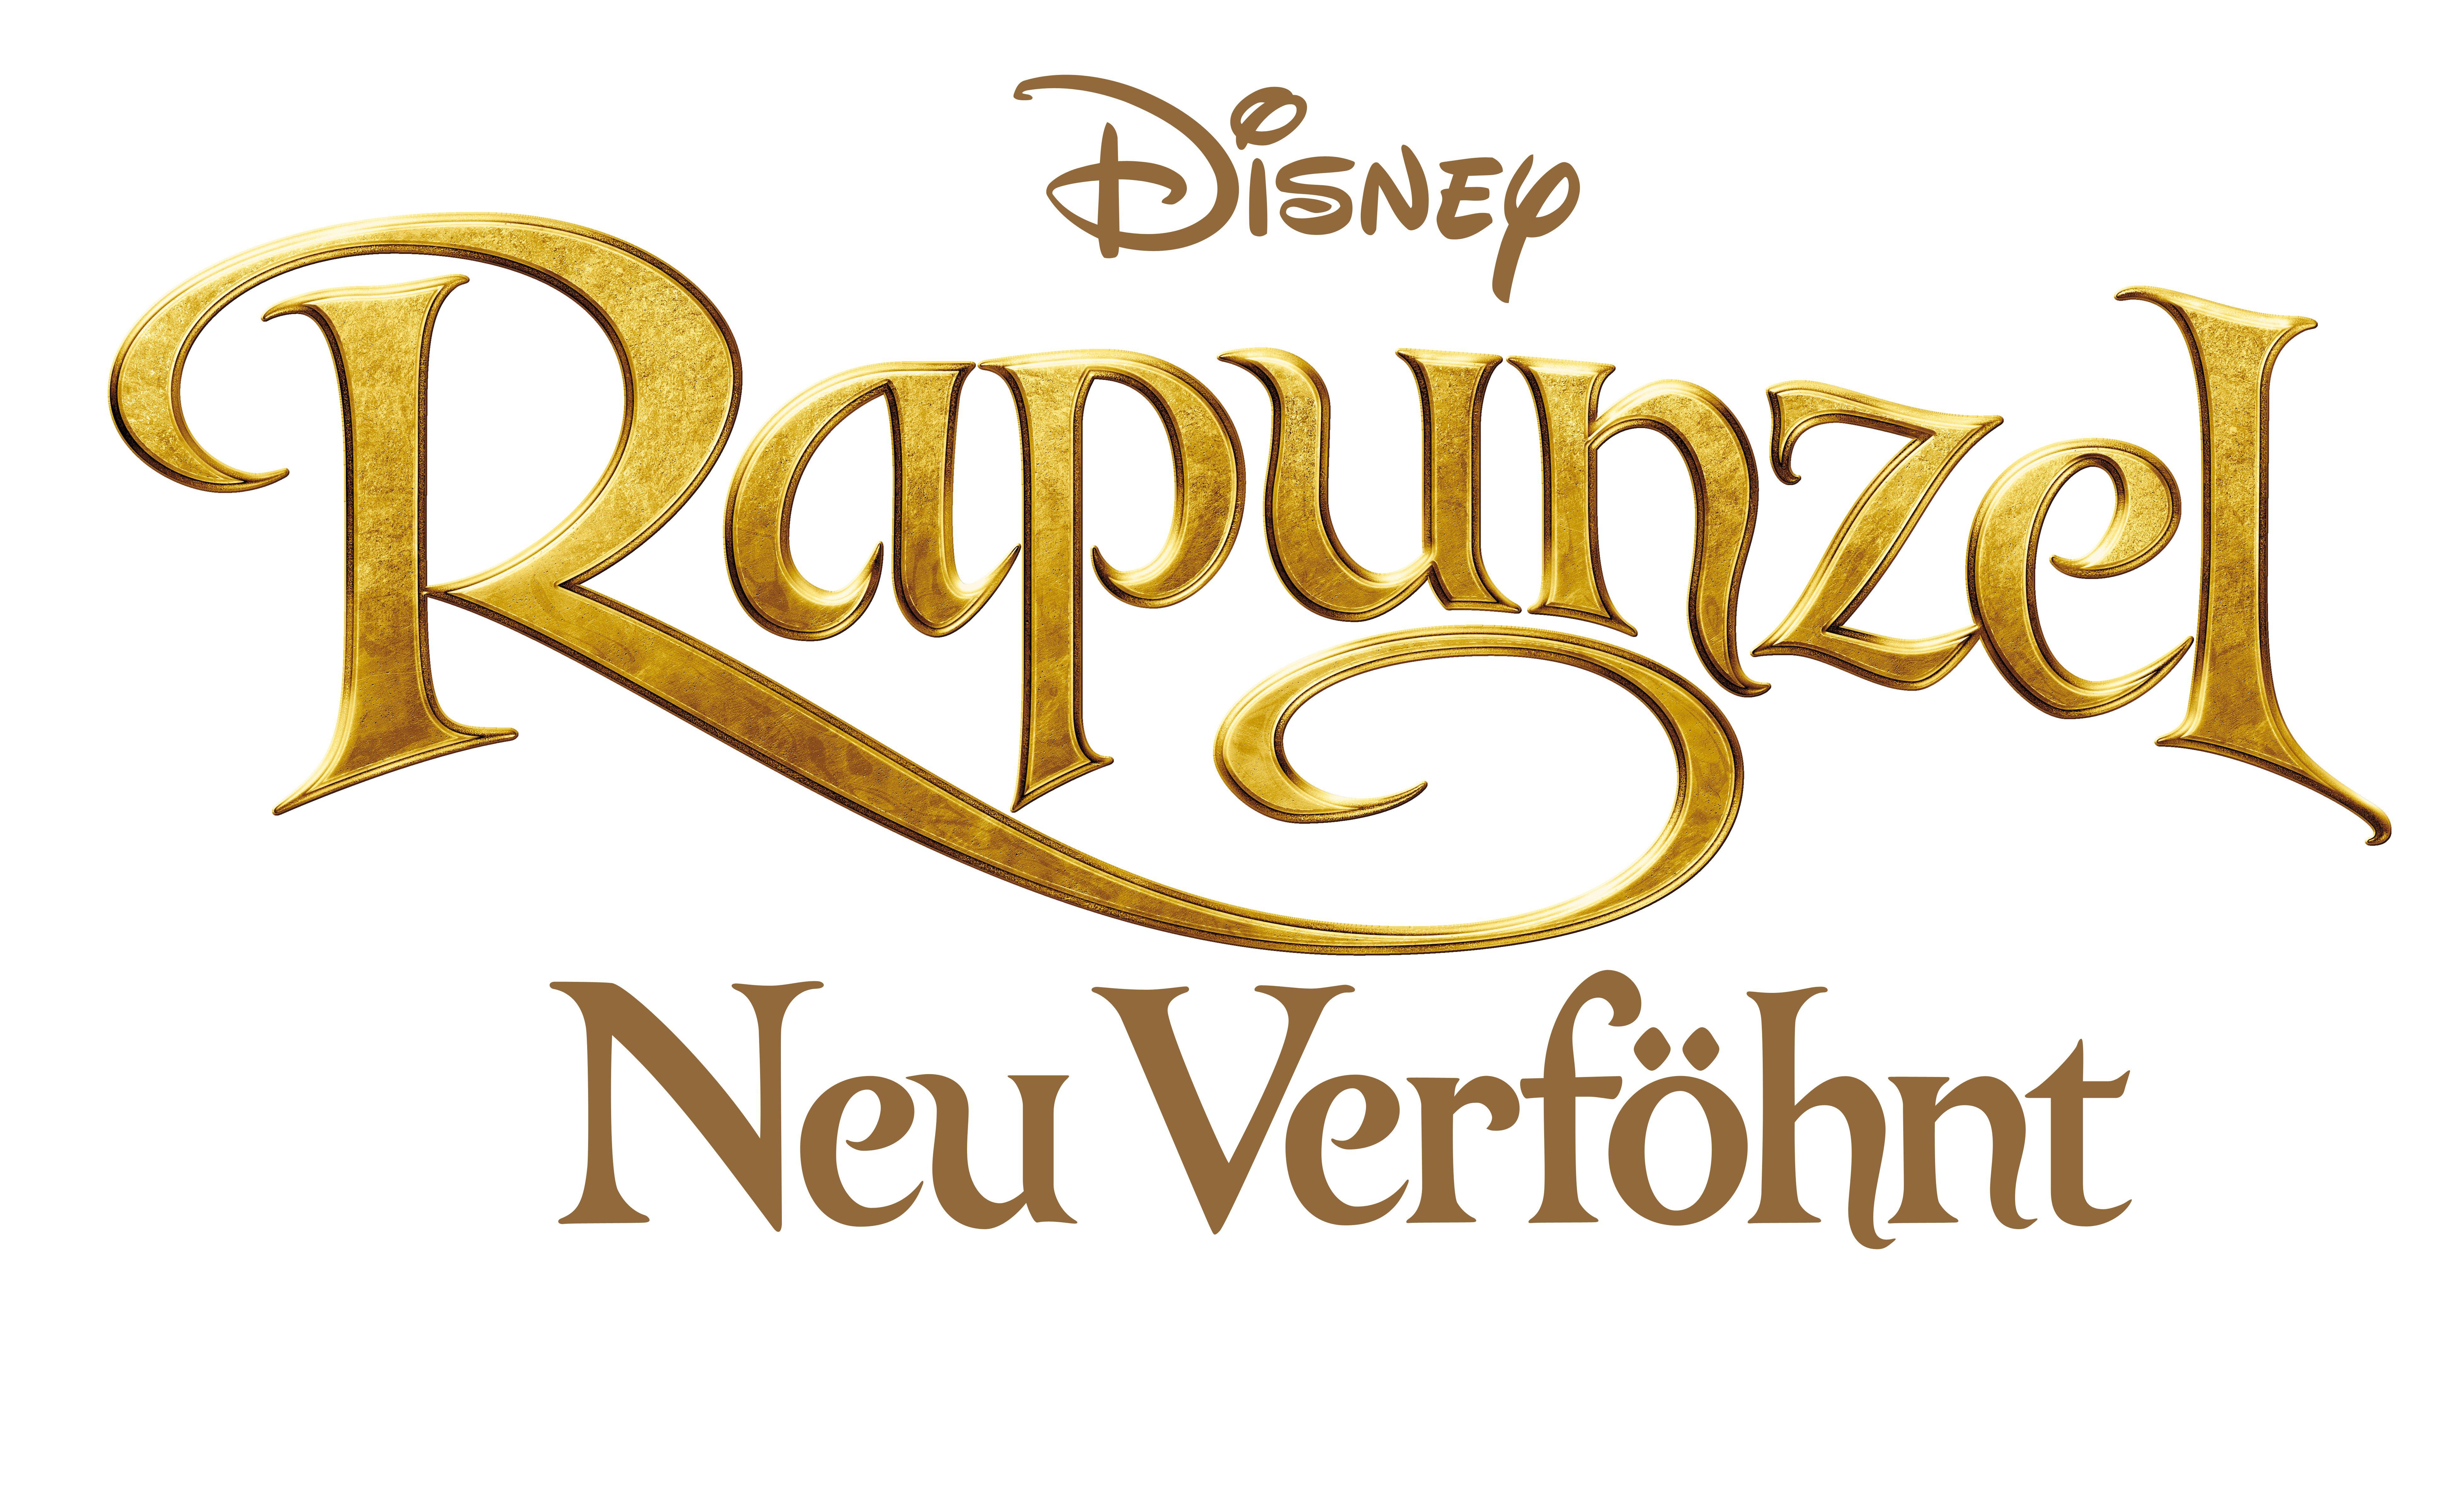 Disney Logo Disney logo, Arts, entertainment, Disney